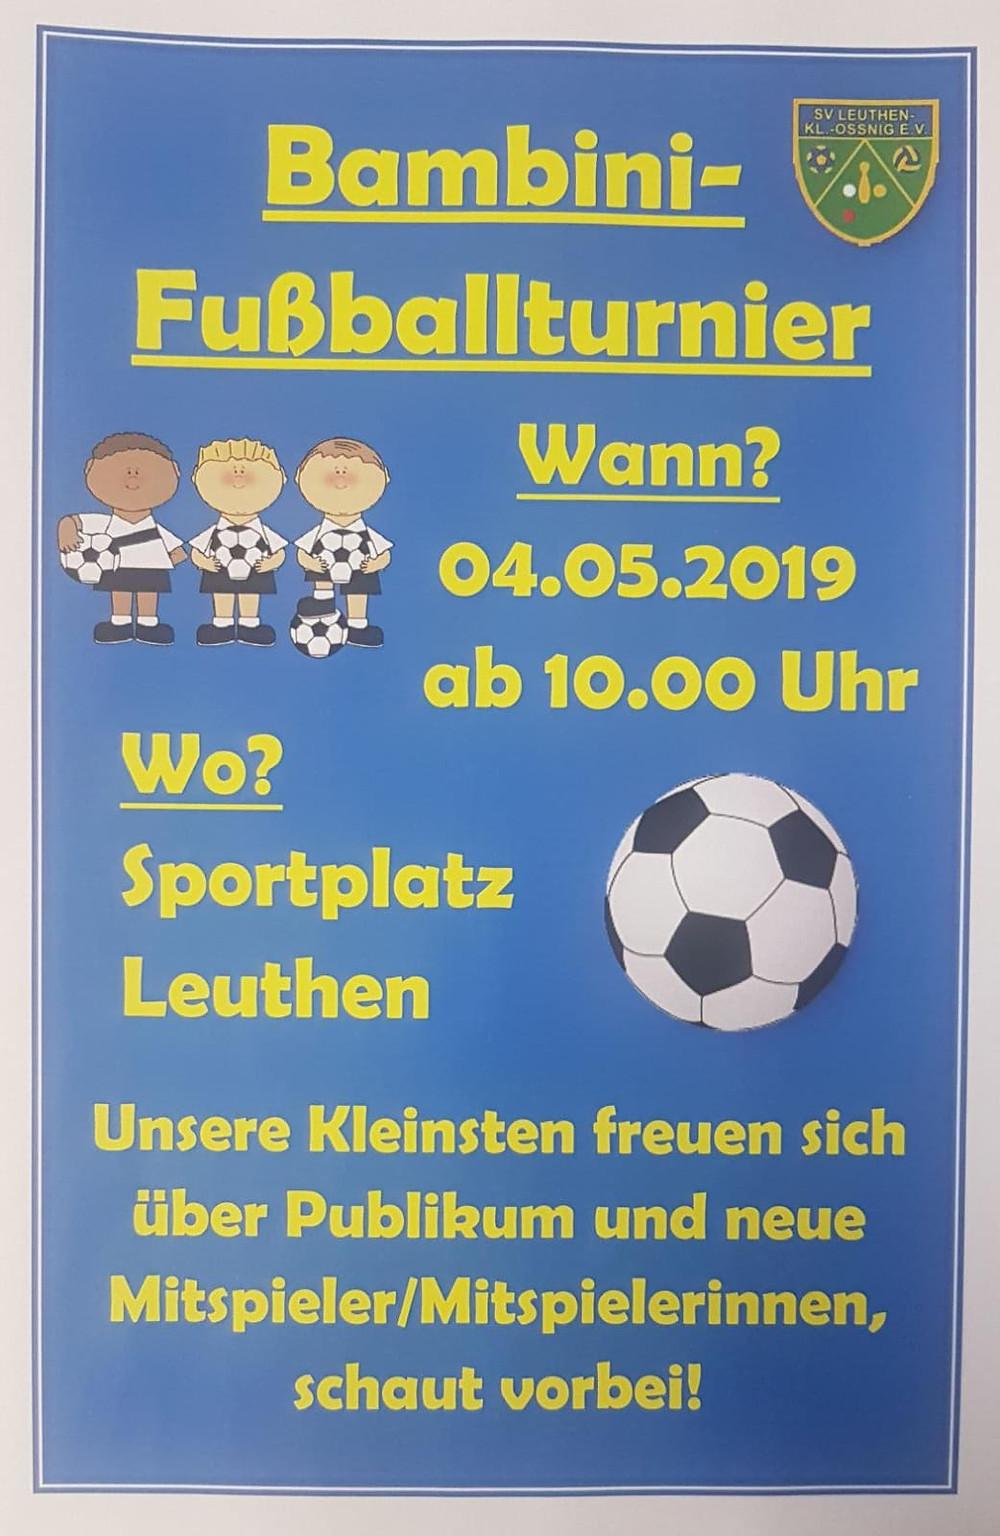 Bambini Turnier Regensburg 2021